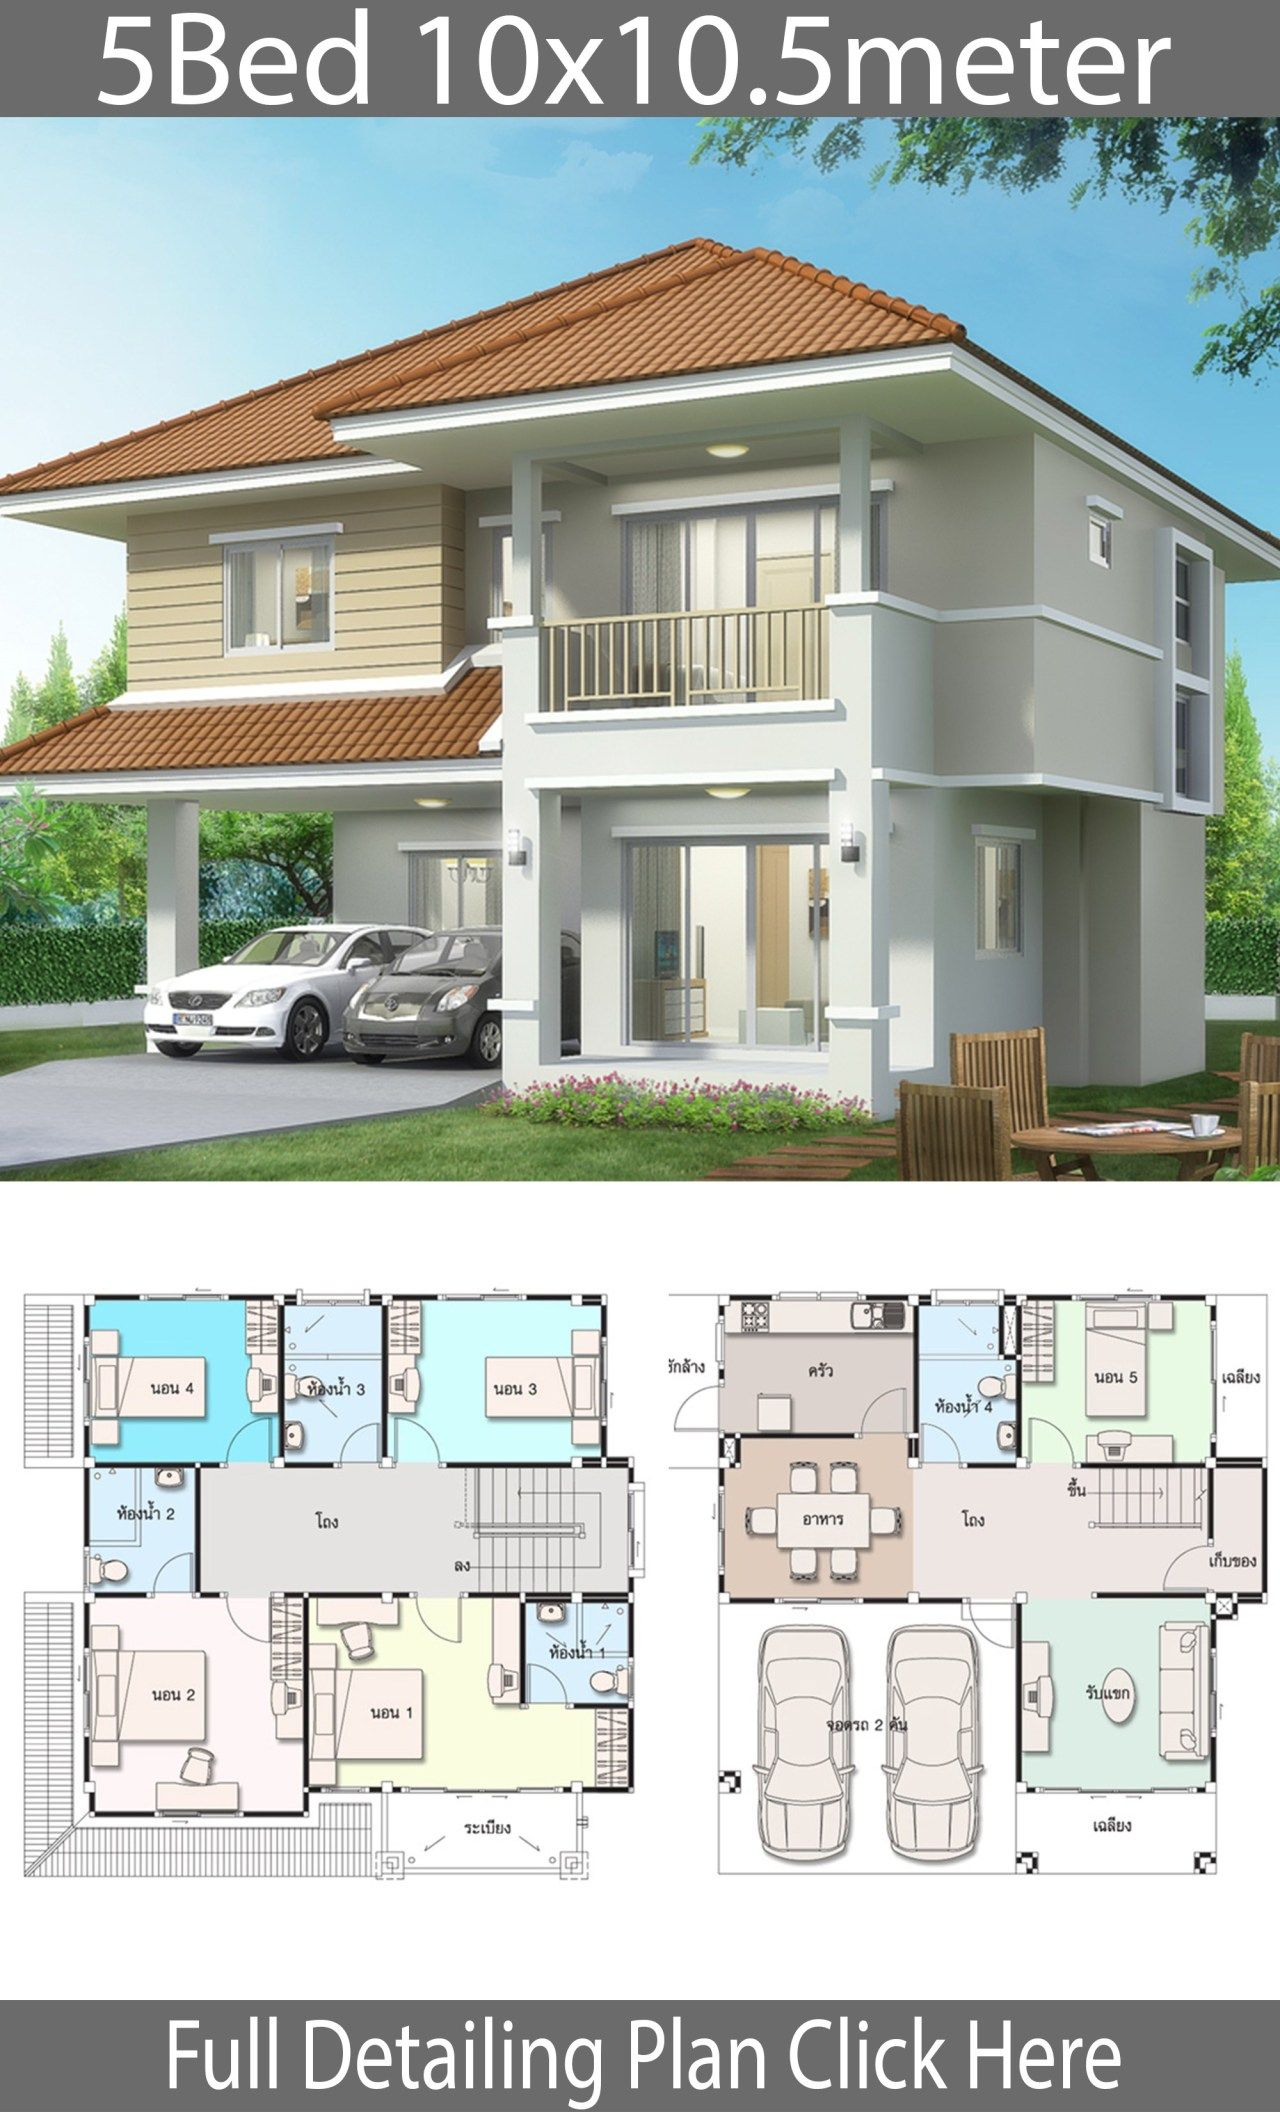 10x10 Bedroom: House Design Plan 10x10.5m With 5 Bedrooms